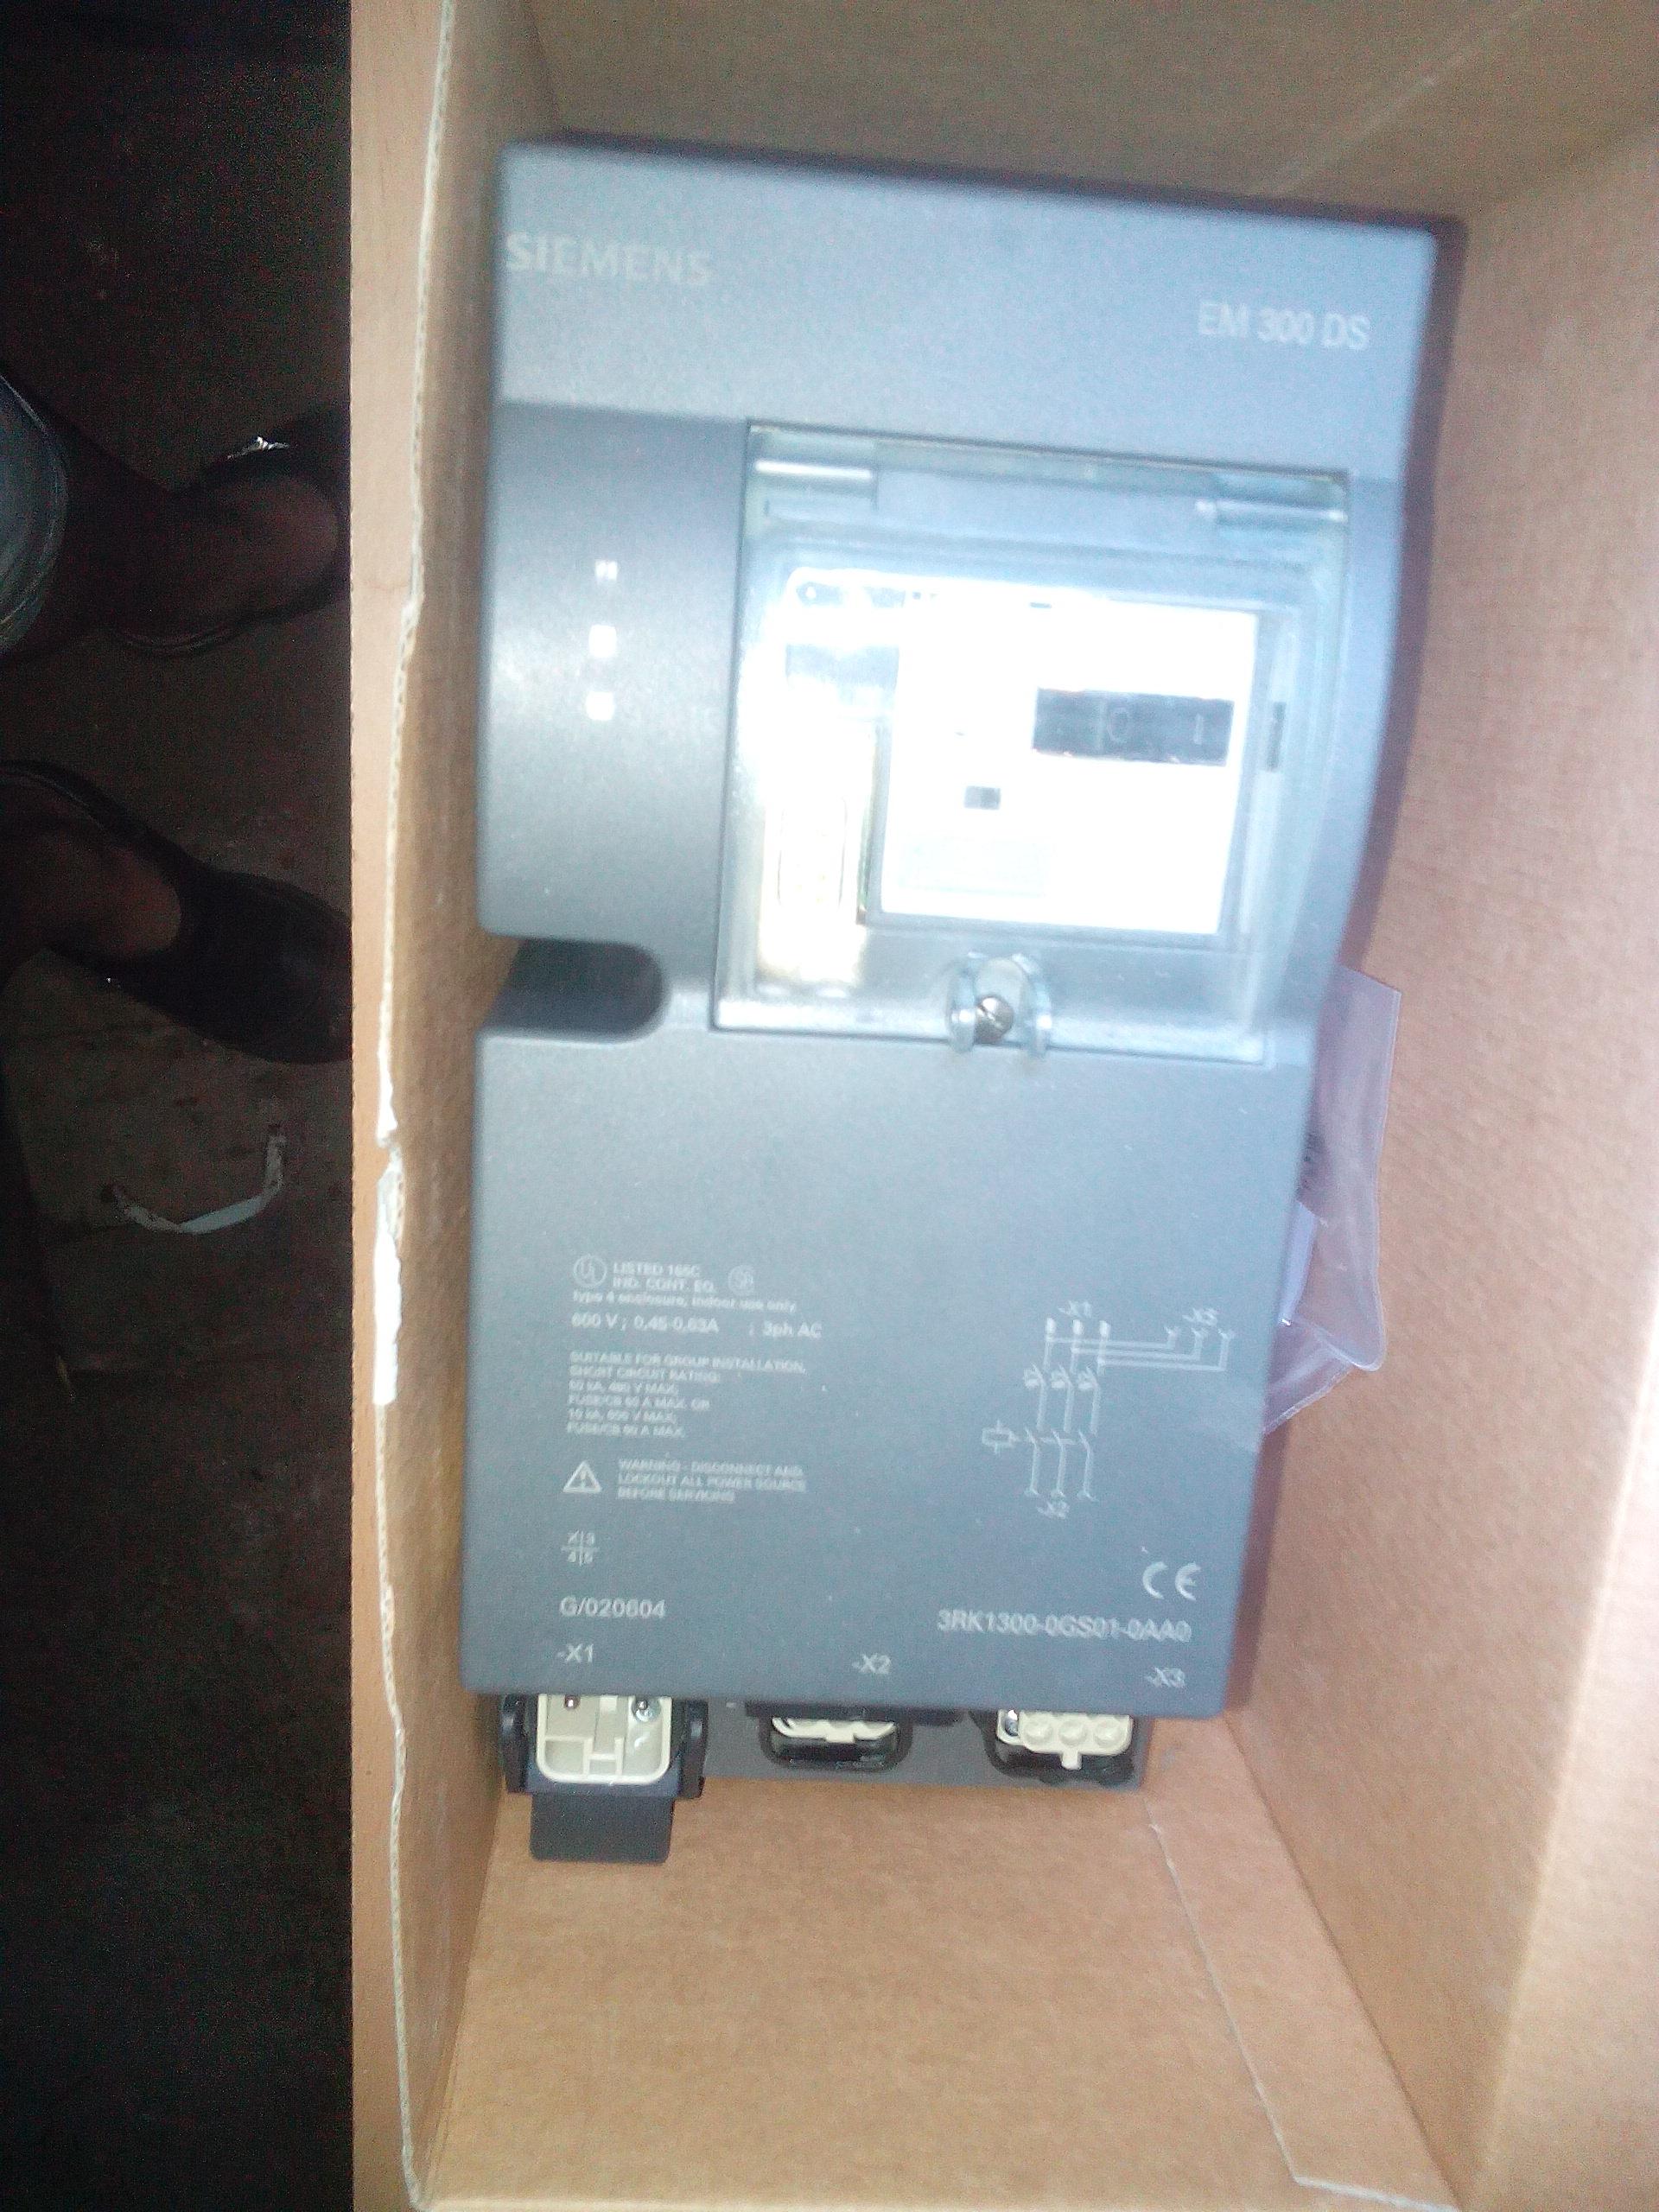 Danfoss Soft Starter Mcd 202 Manual Wiring Diagram Vlt Aqua